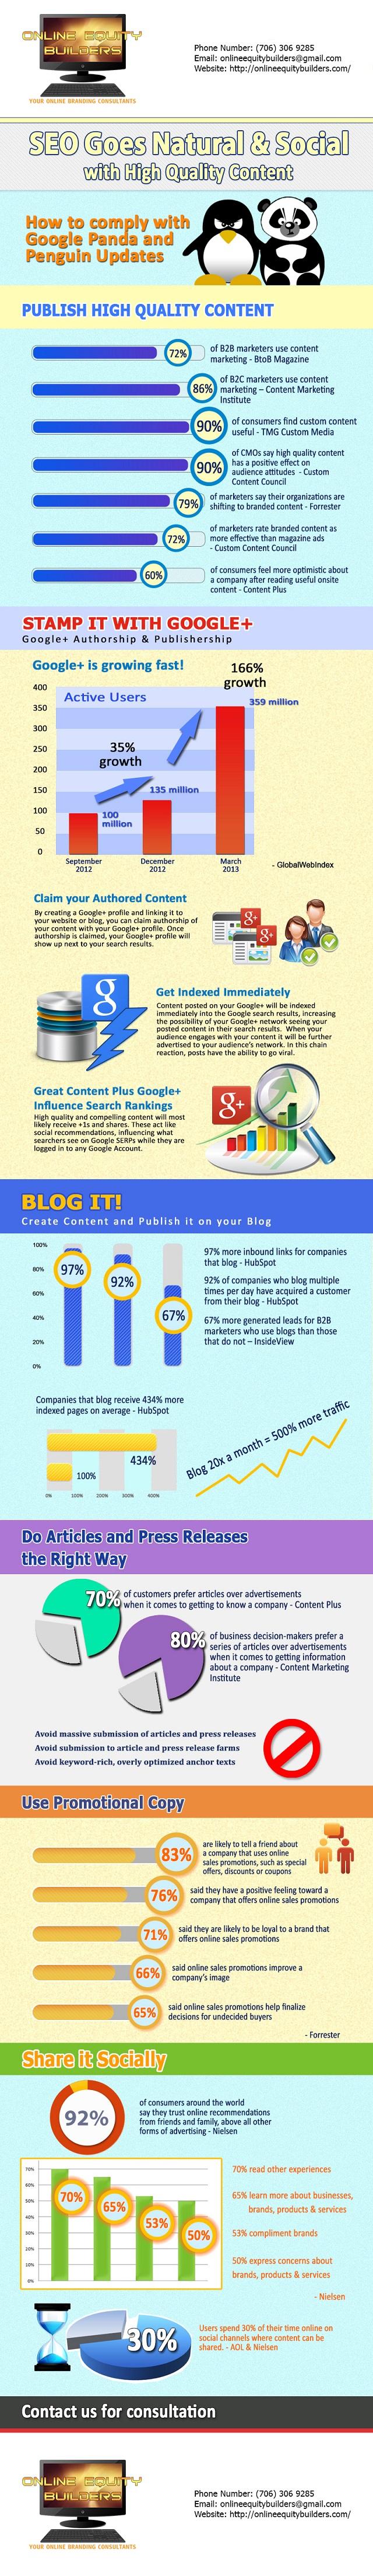 OnlineEquityBuilders.com-SEO-Infographic-Blog-resized